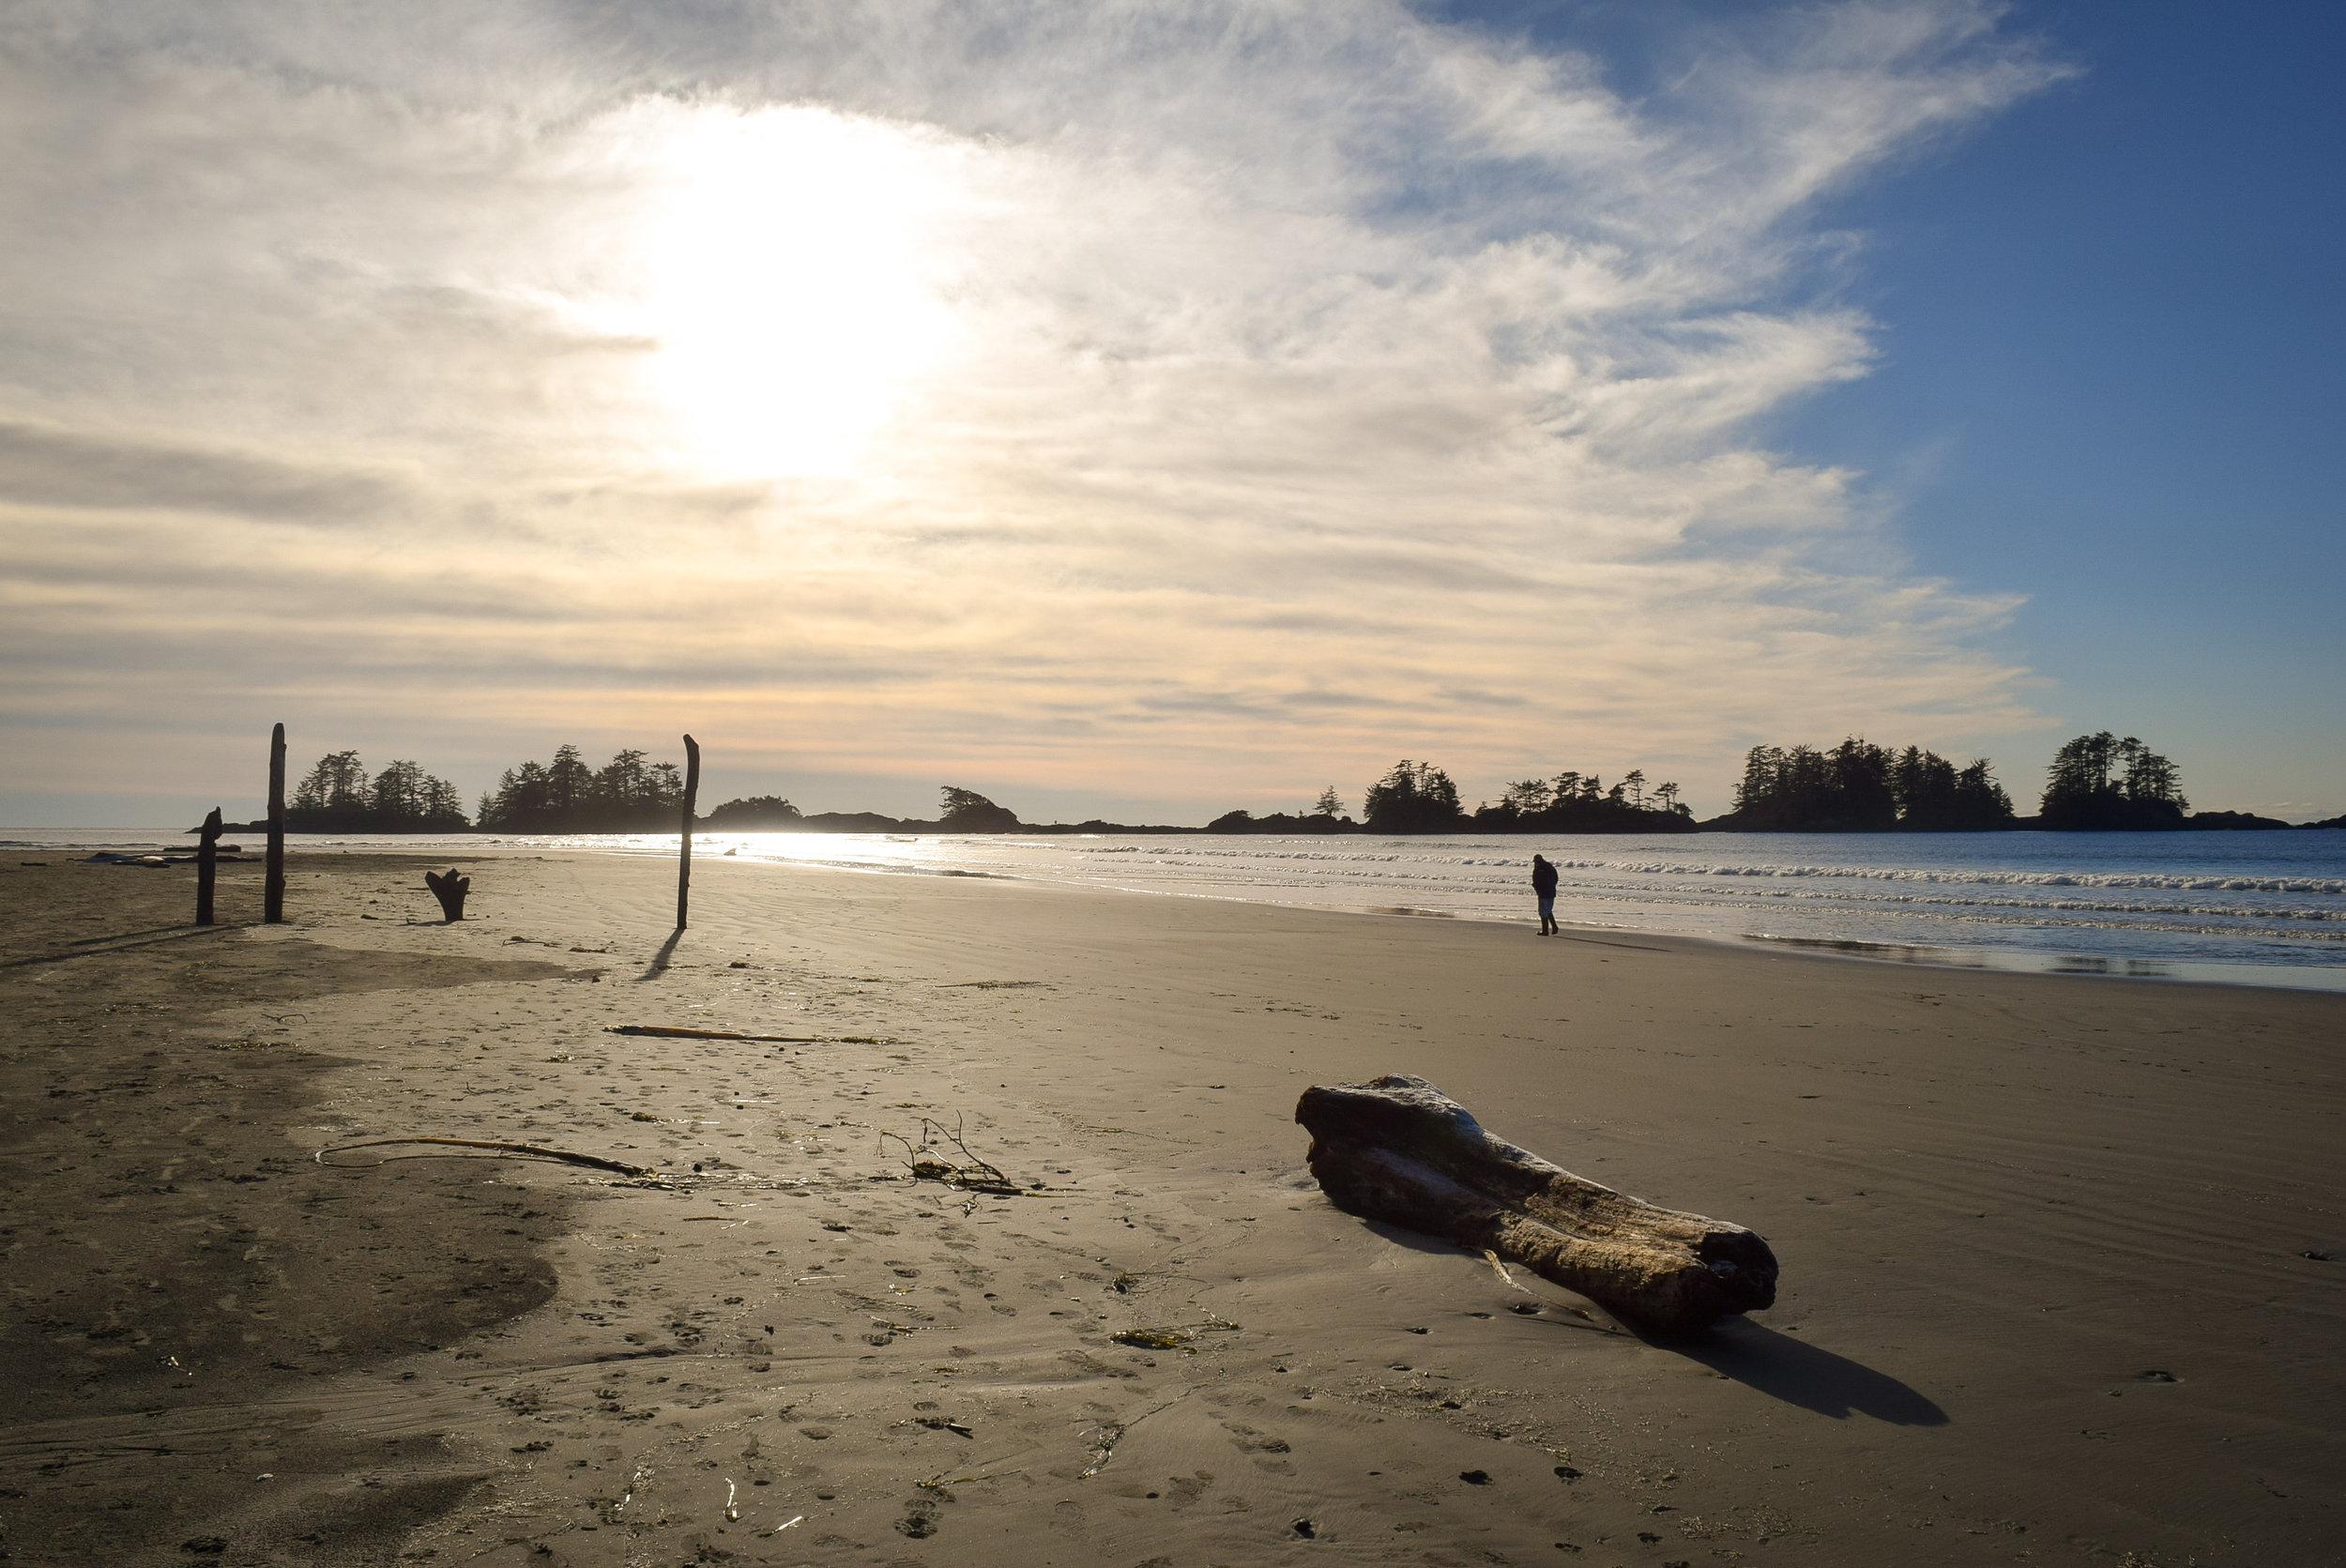 Beachcombing on Chesterman Beach